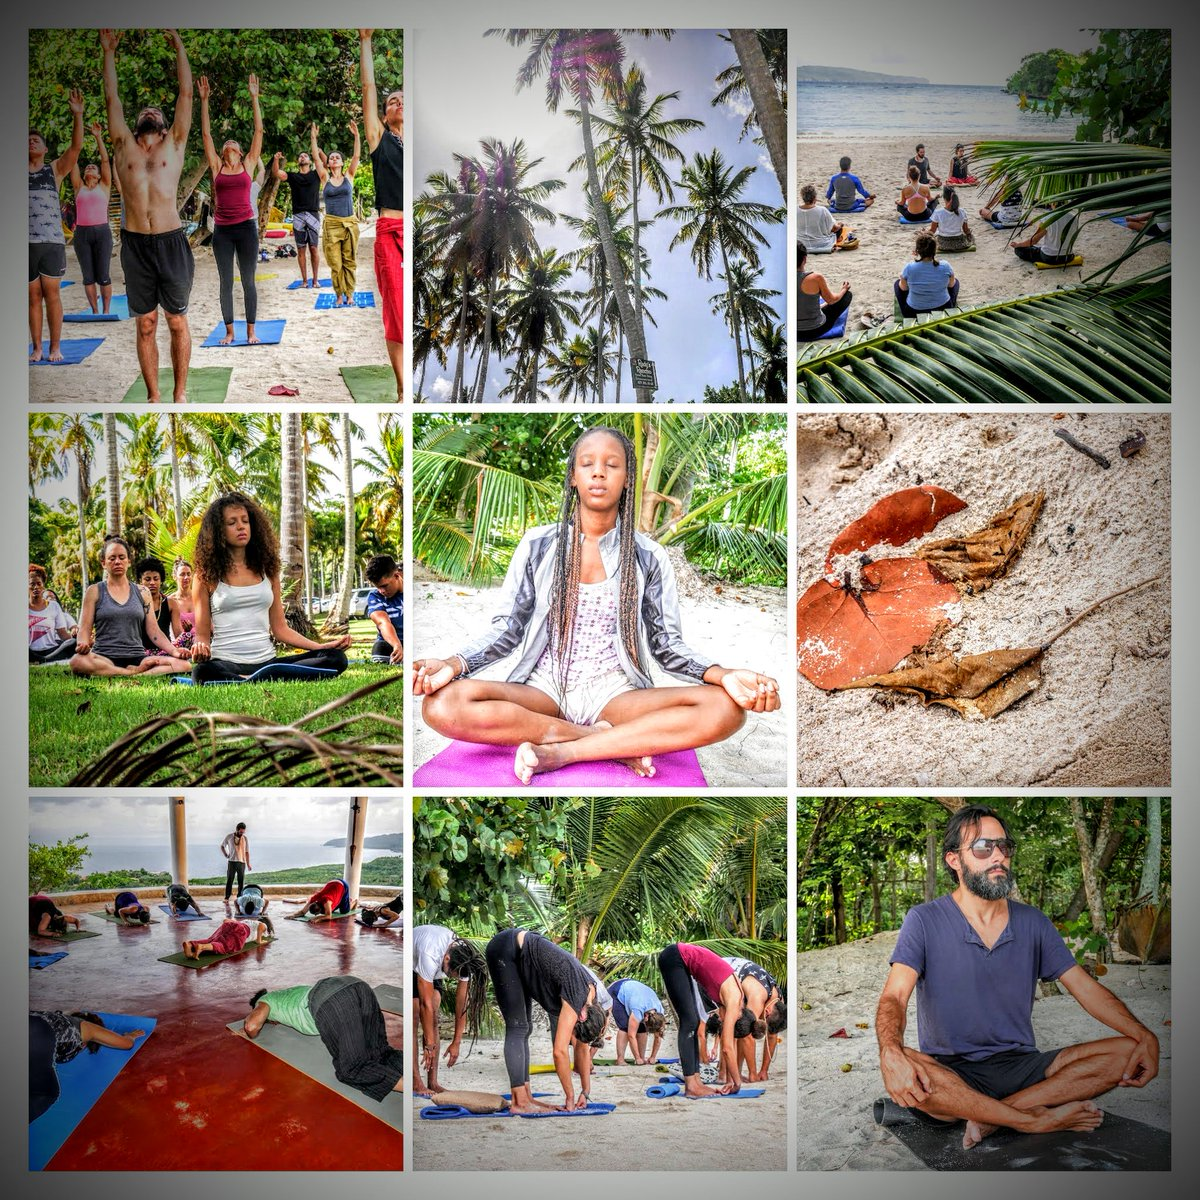 Caribe Yoga on Twitter: